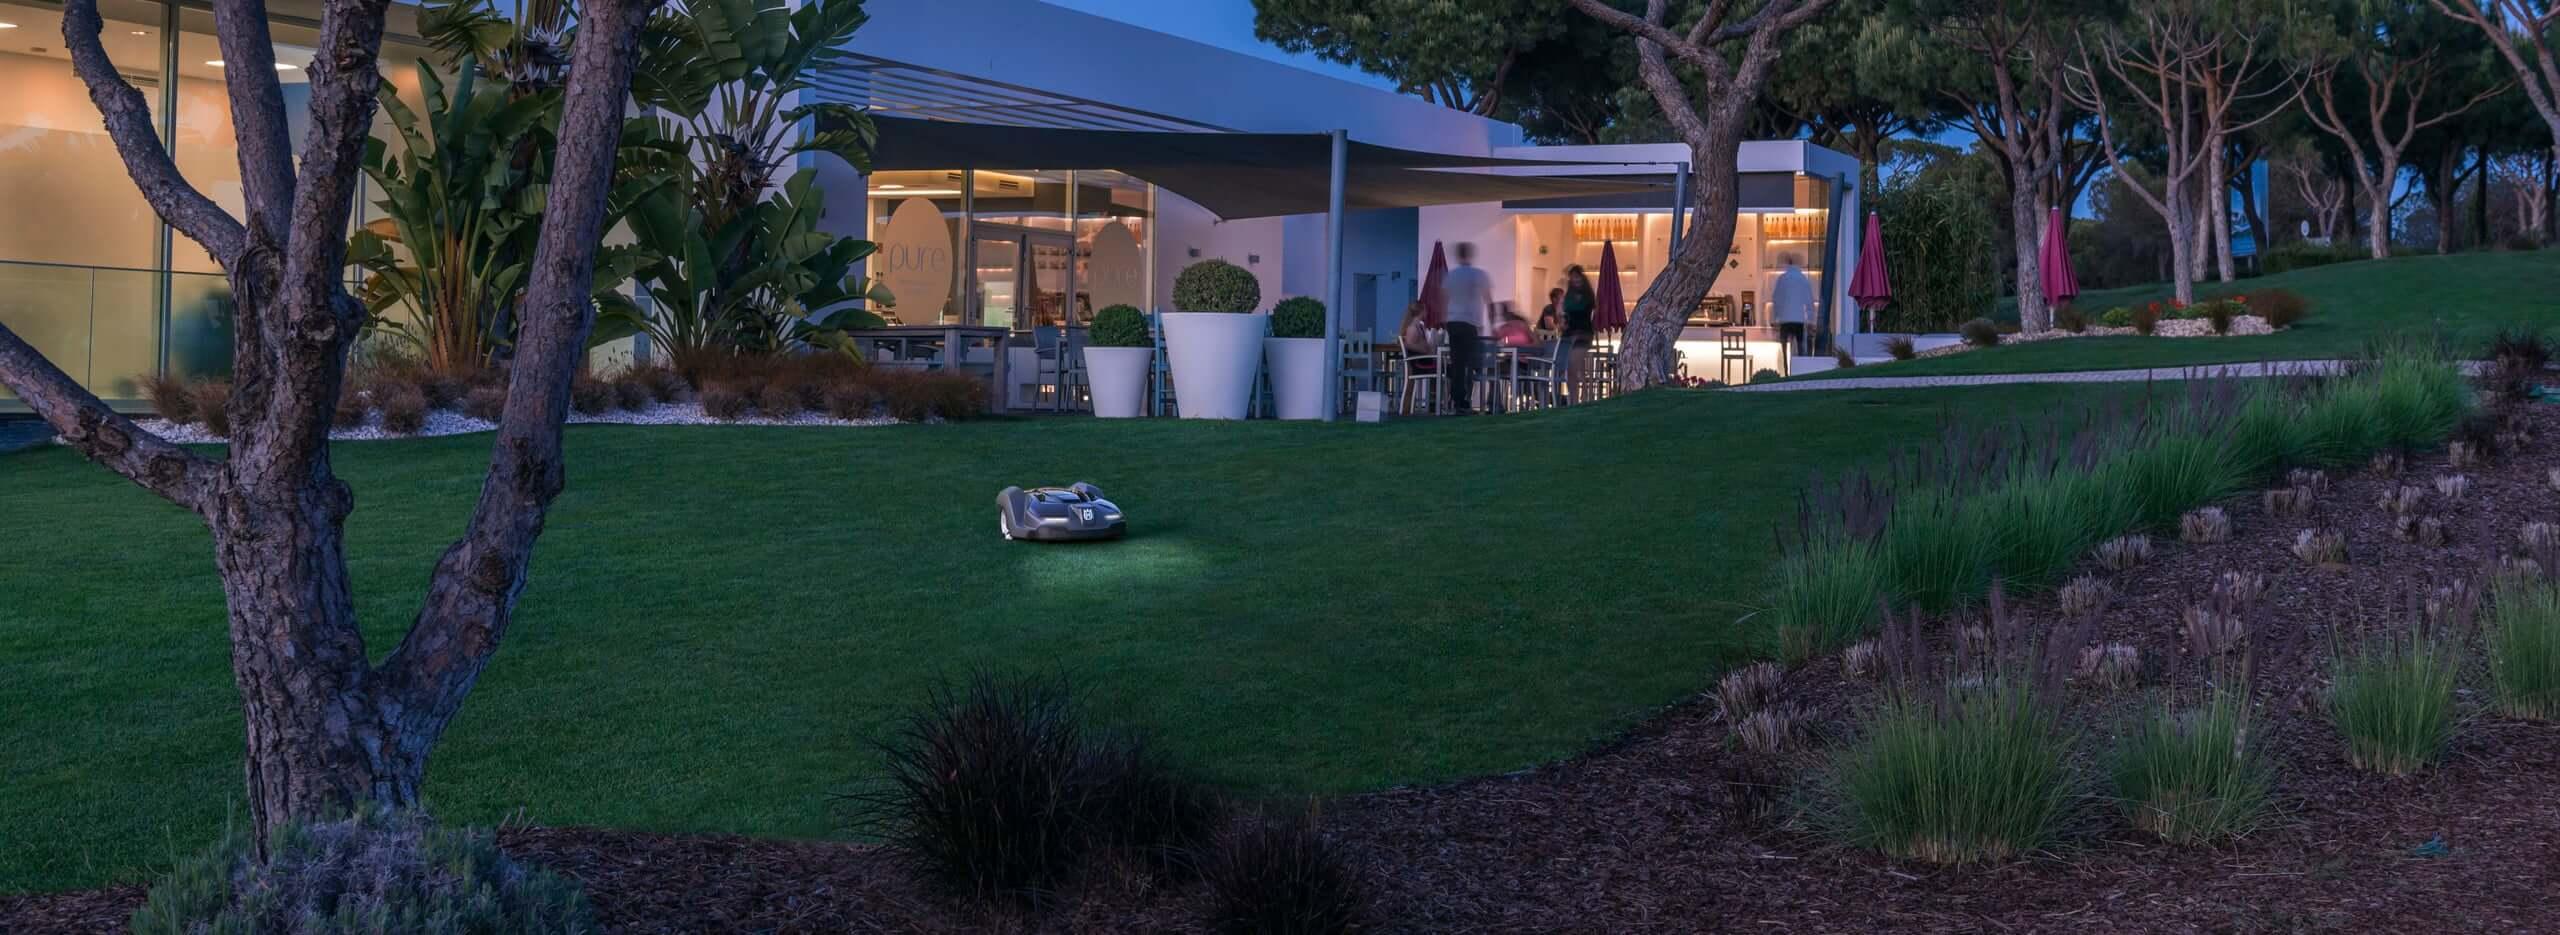 robot lawnmowers 2 (1)